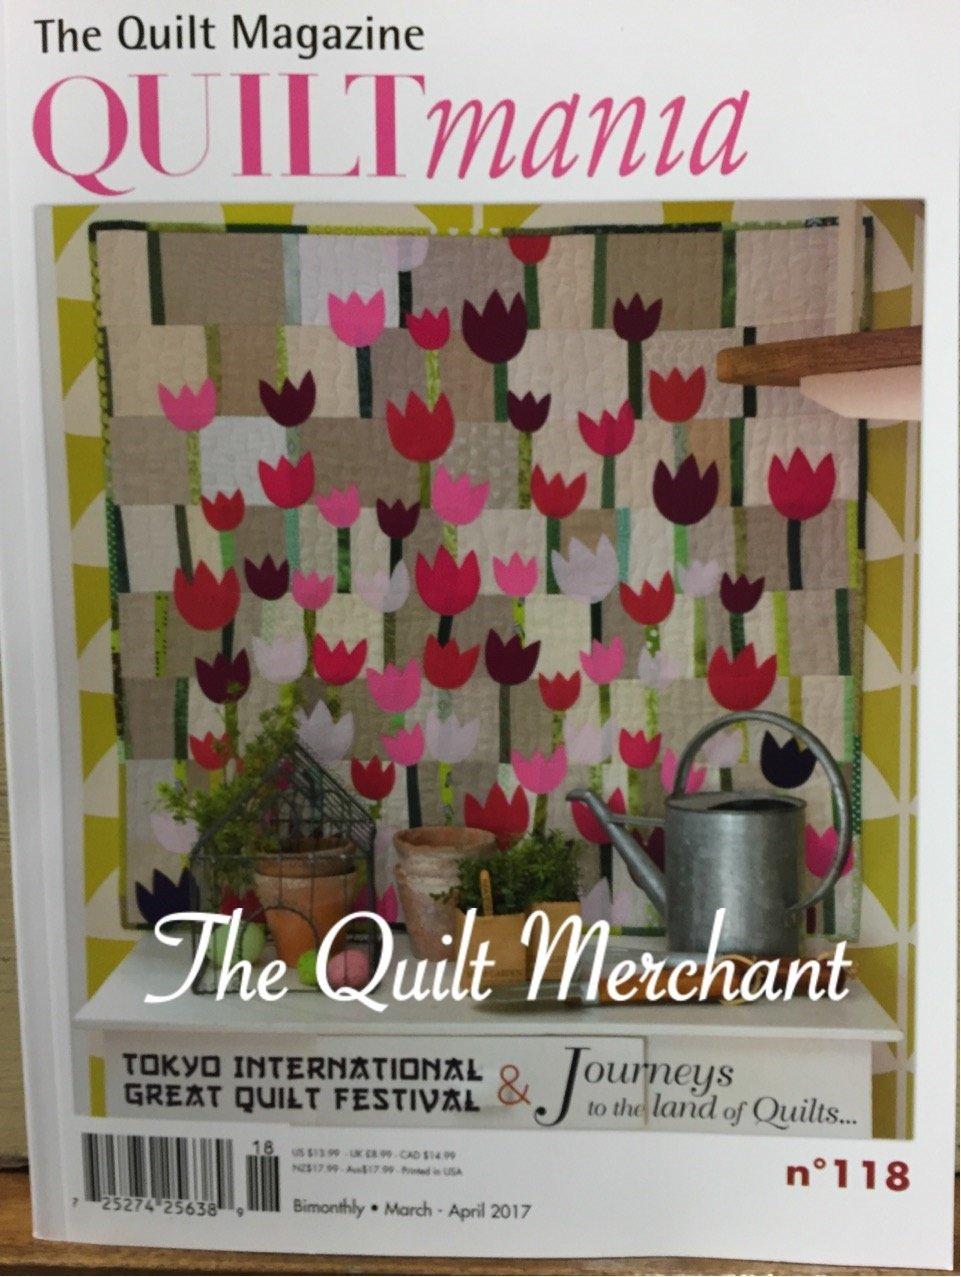 Quiltmania #118 March - April 2017